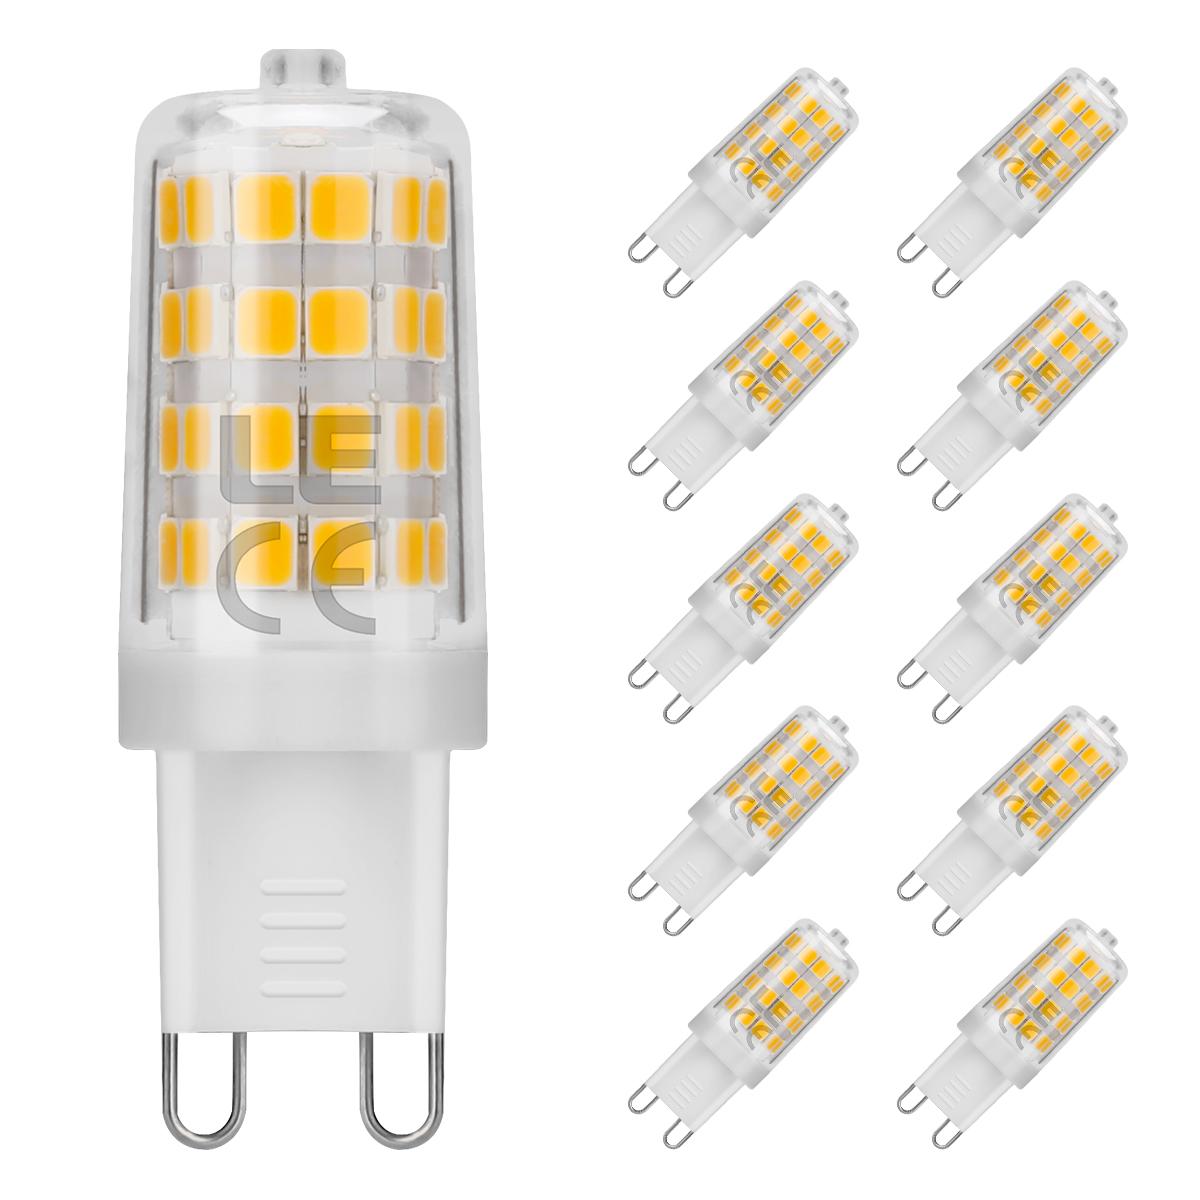 5W 340lm G9 LED Lampen, 360° Abstrahlwinkel LED Birnen, ersetzt 50W Halogenlampen, Warmweiß, 10er Set